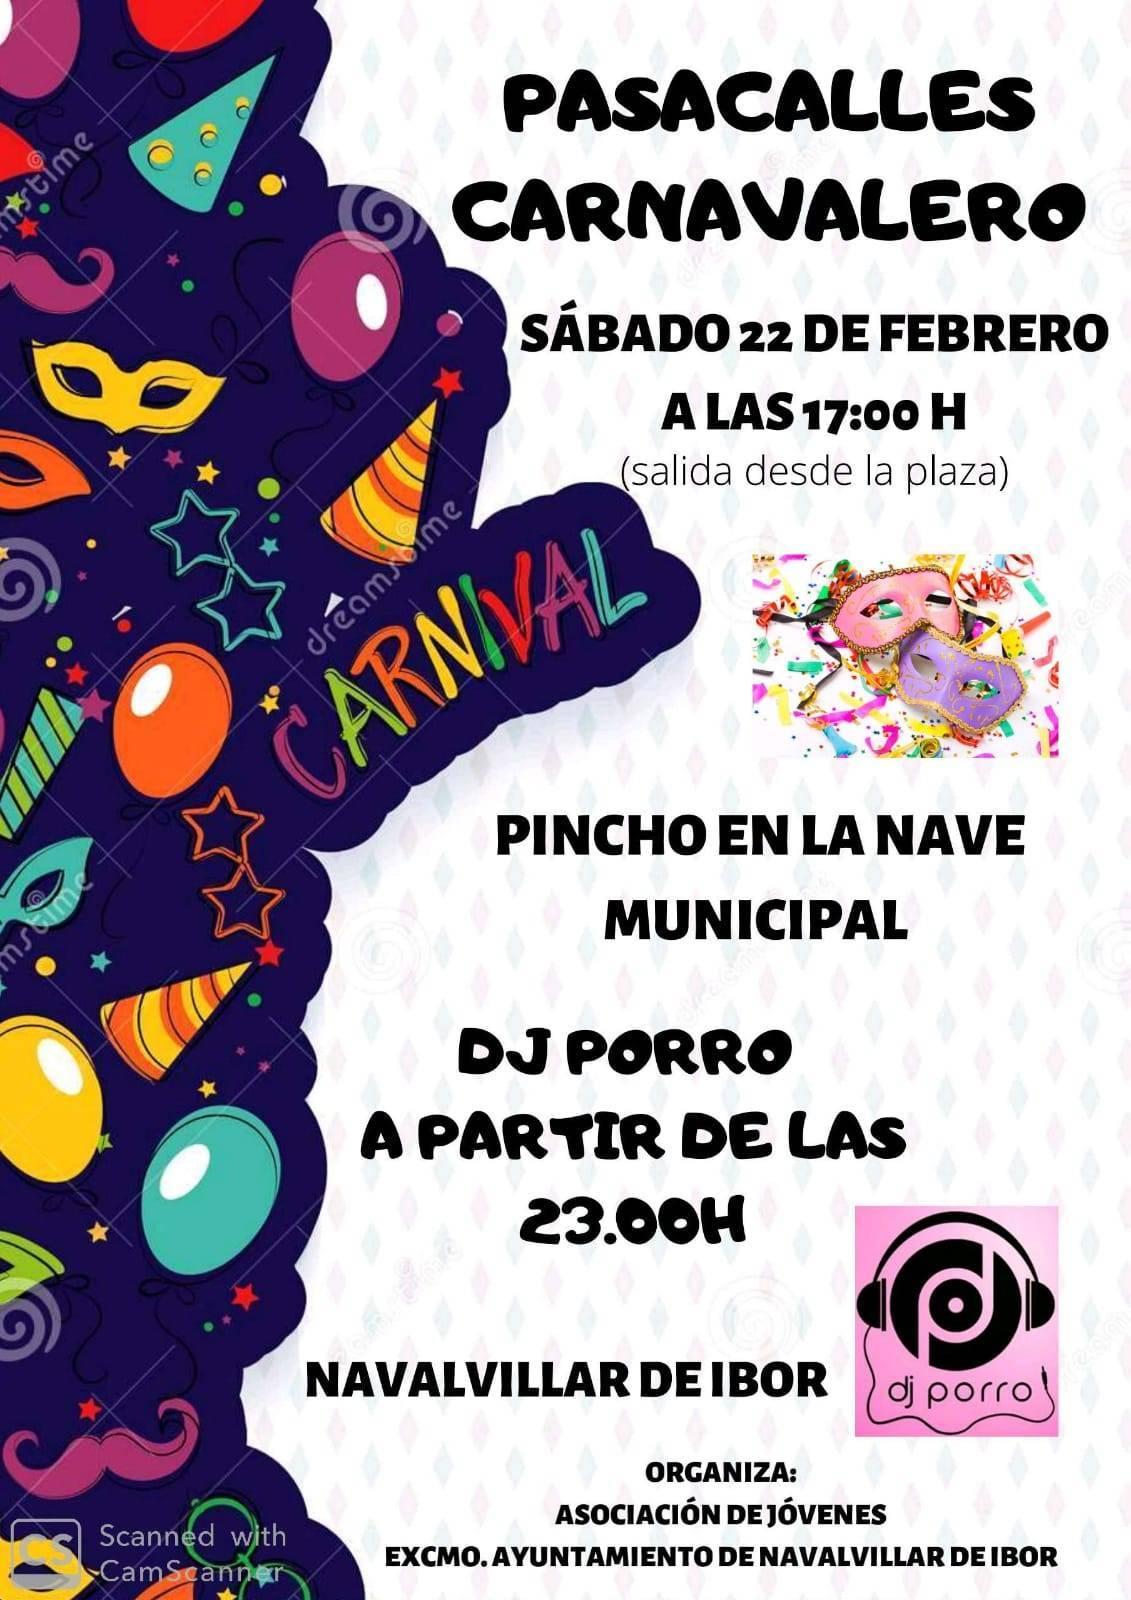 Pasacalles carnavalero 2020 - Navalvillar de Ibor (Cáceres)